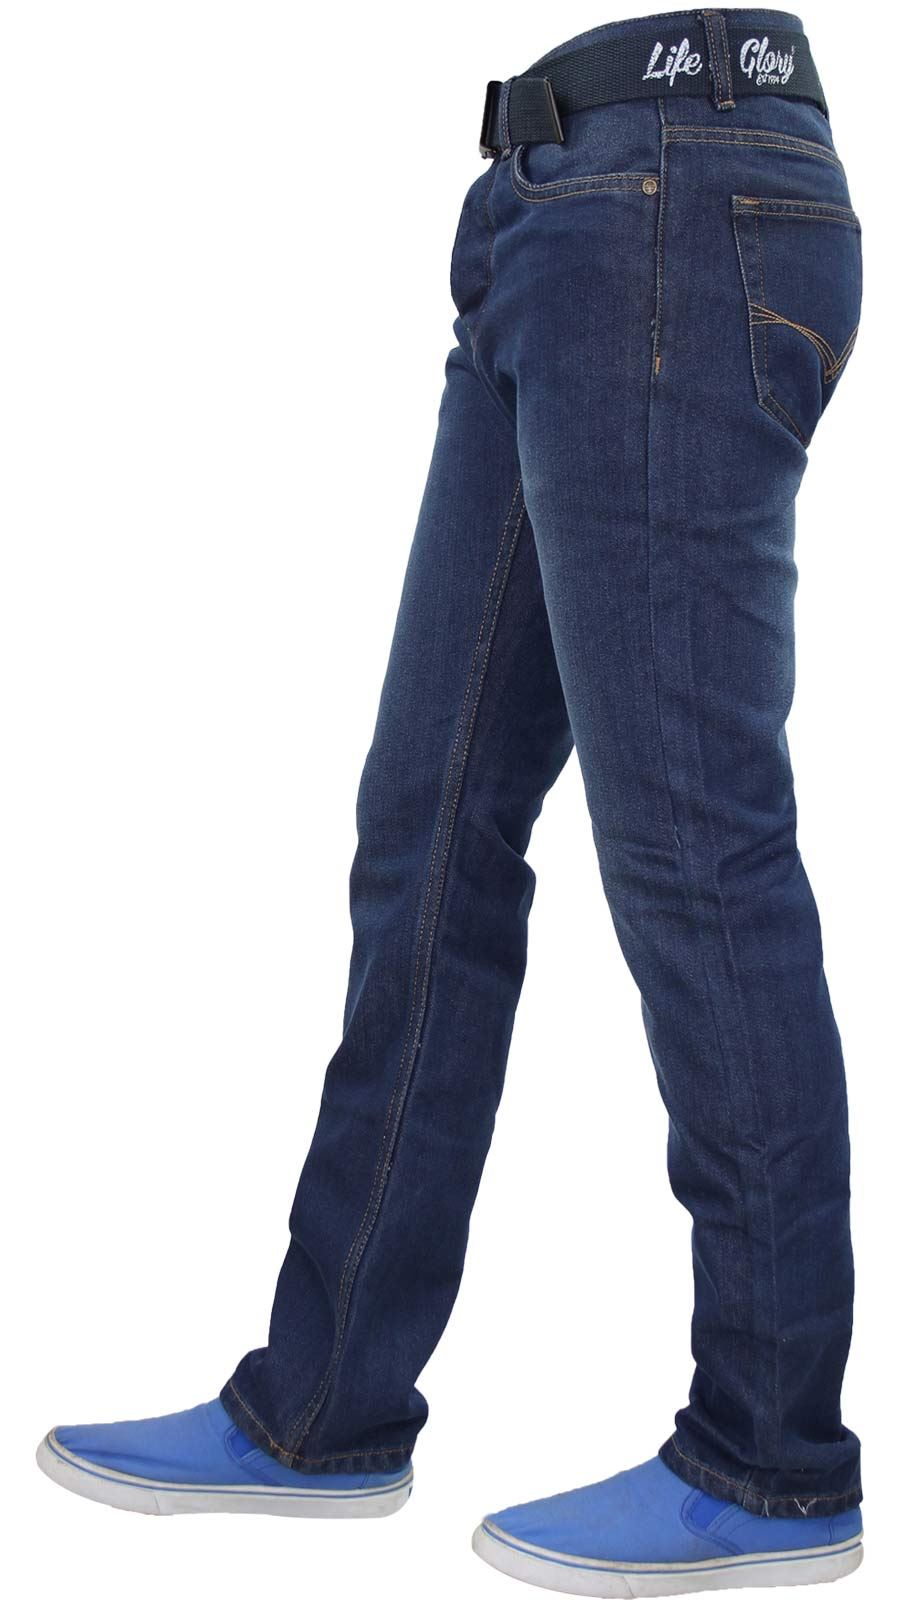 Mens-Regular-Fit-Jeans-Straight-Leg-Denim-Pants-Casual-Trousers-With-Free-Belt thumbnail 10